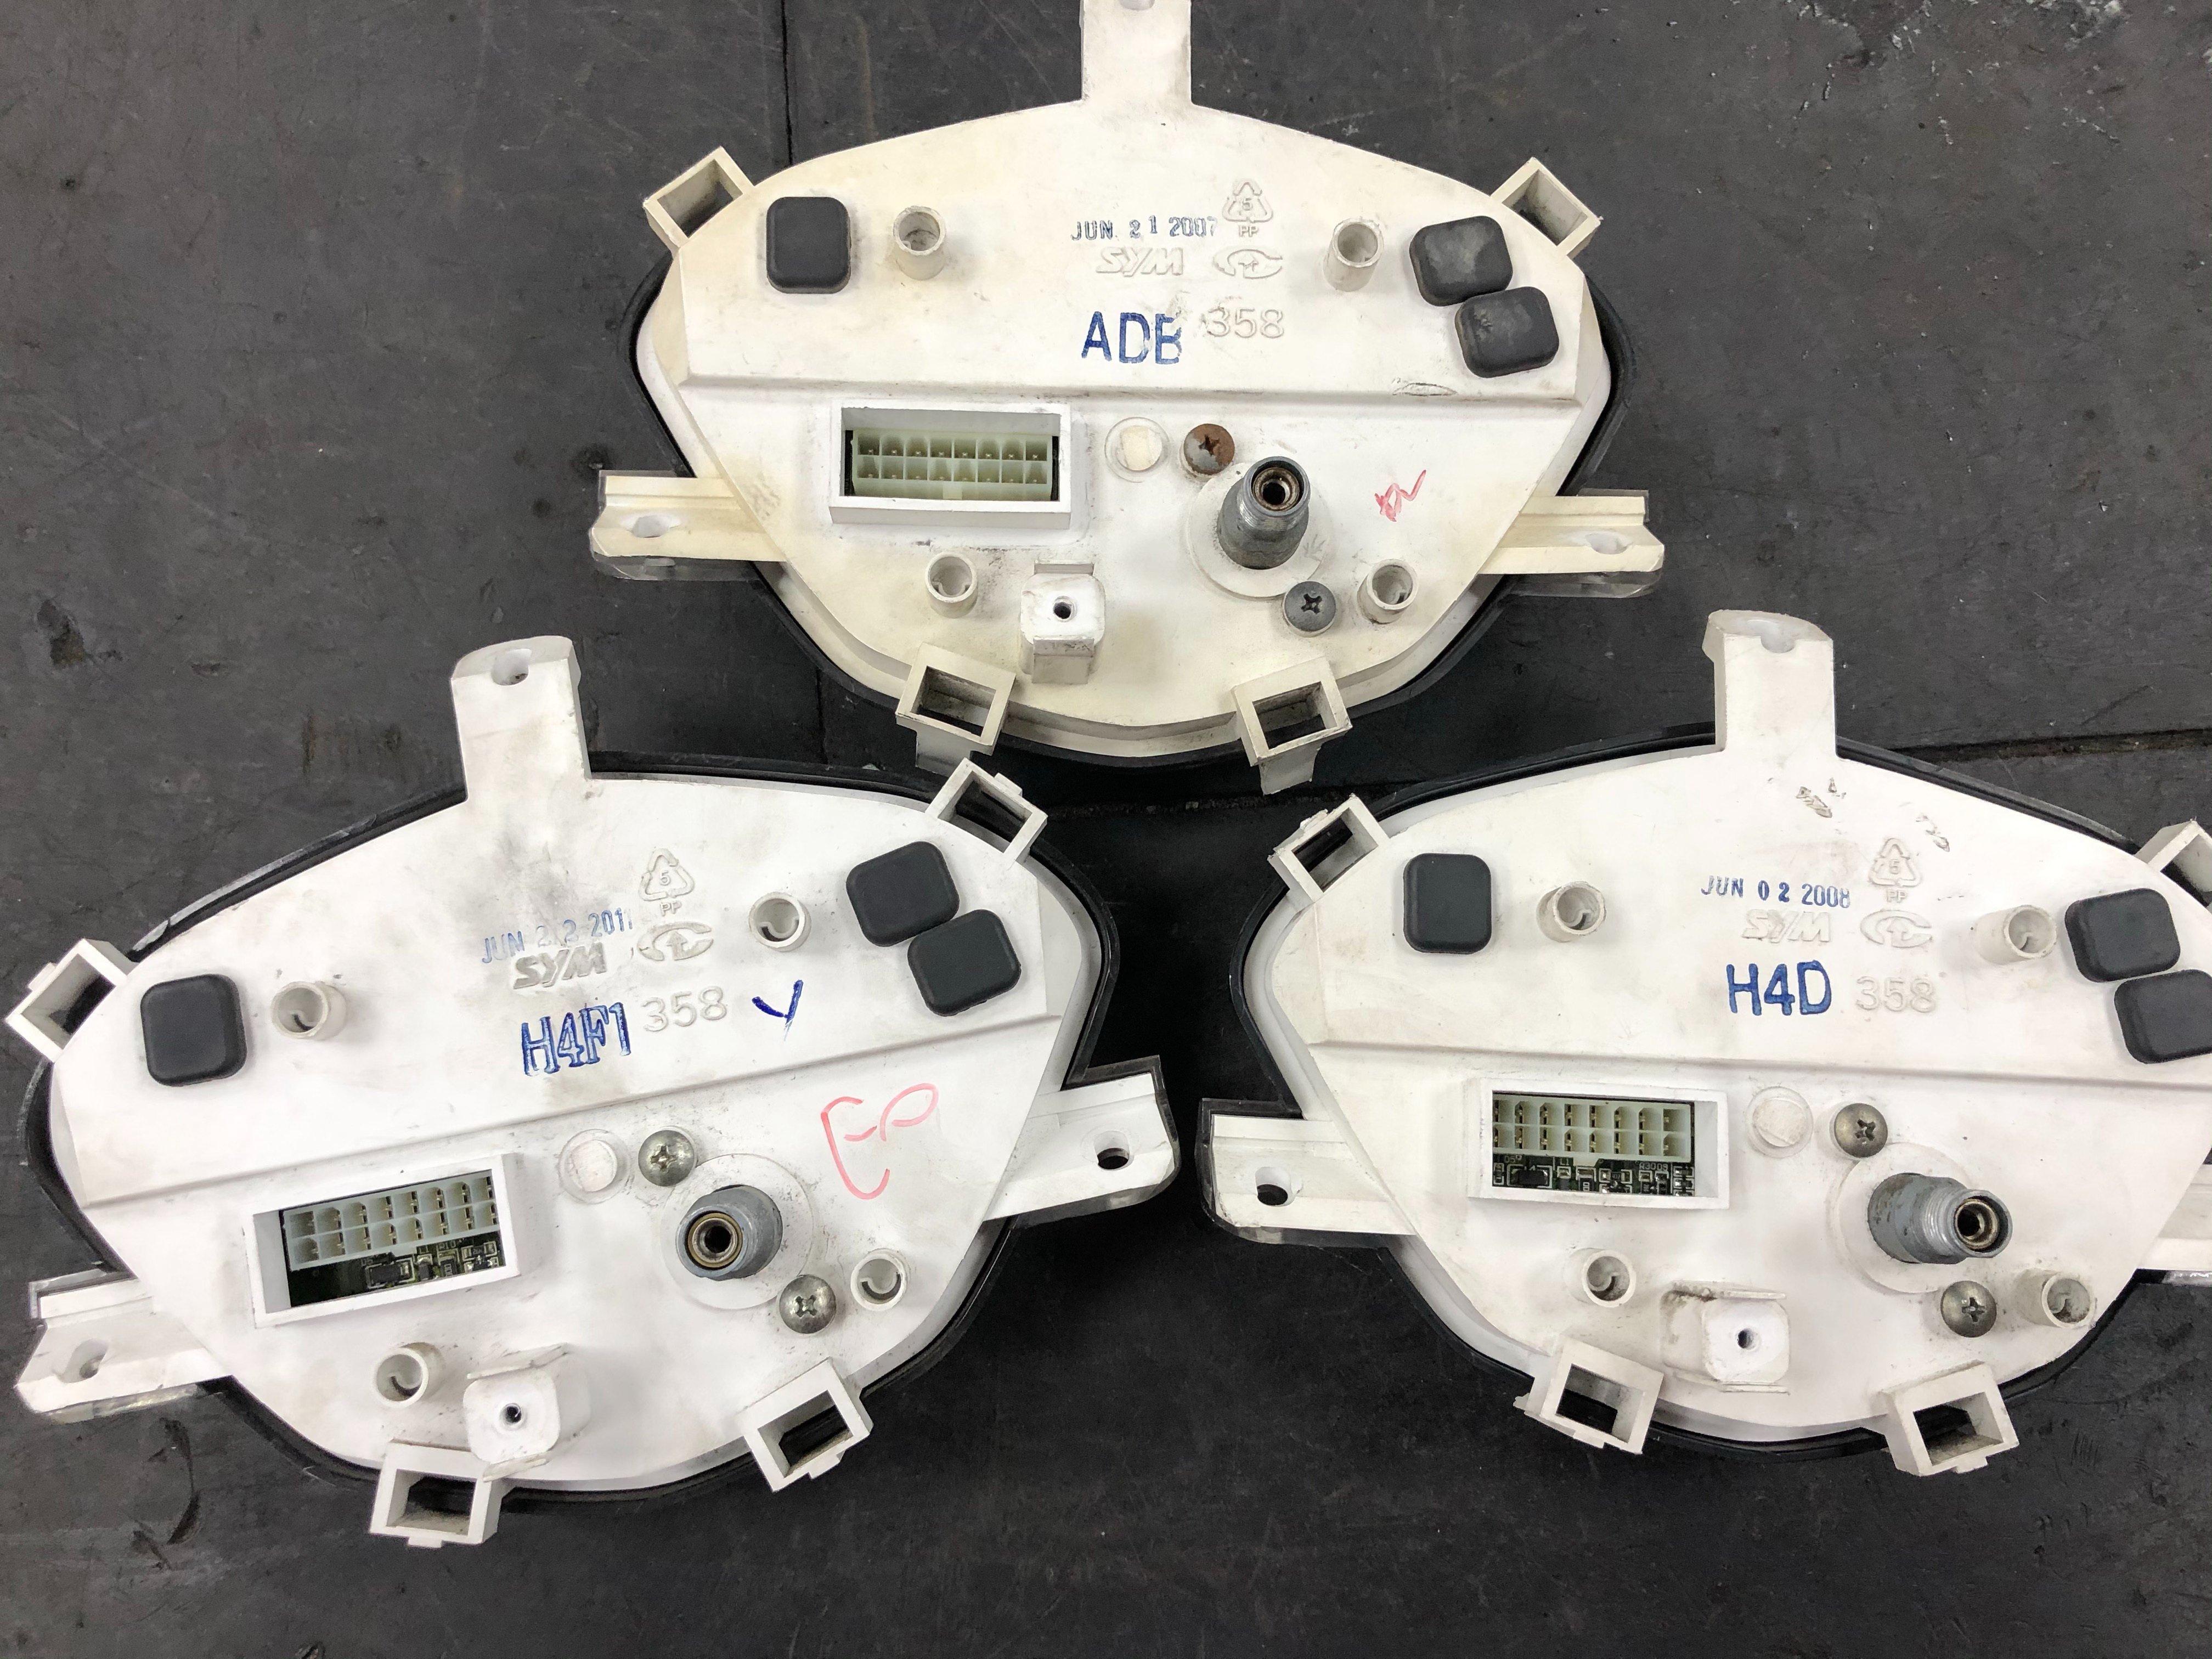 SYM GT 125 儀表 碼錶 中古整新品 化油 噴射 車種 皆有修理 液晶淡化 按鍵 油表 轉數 功能皆正常